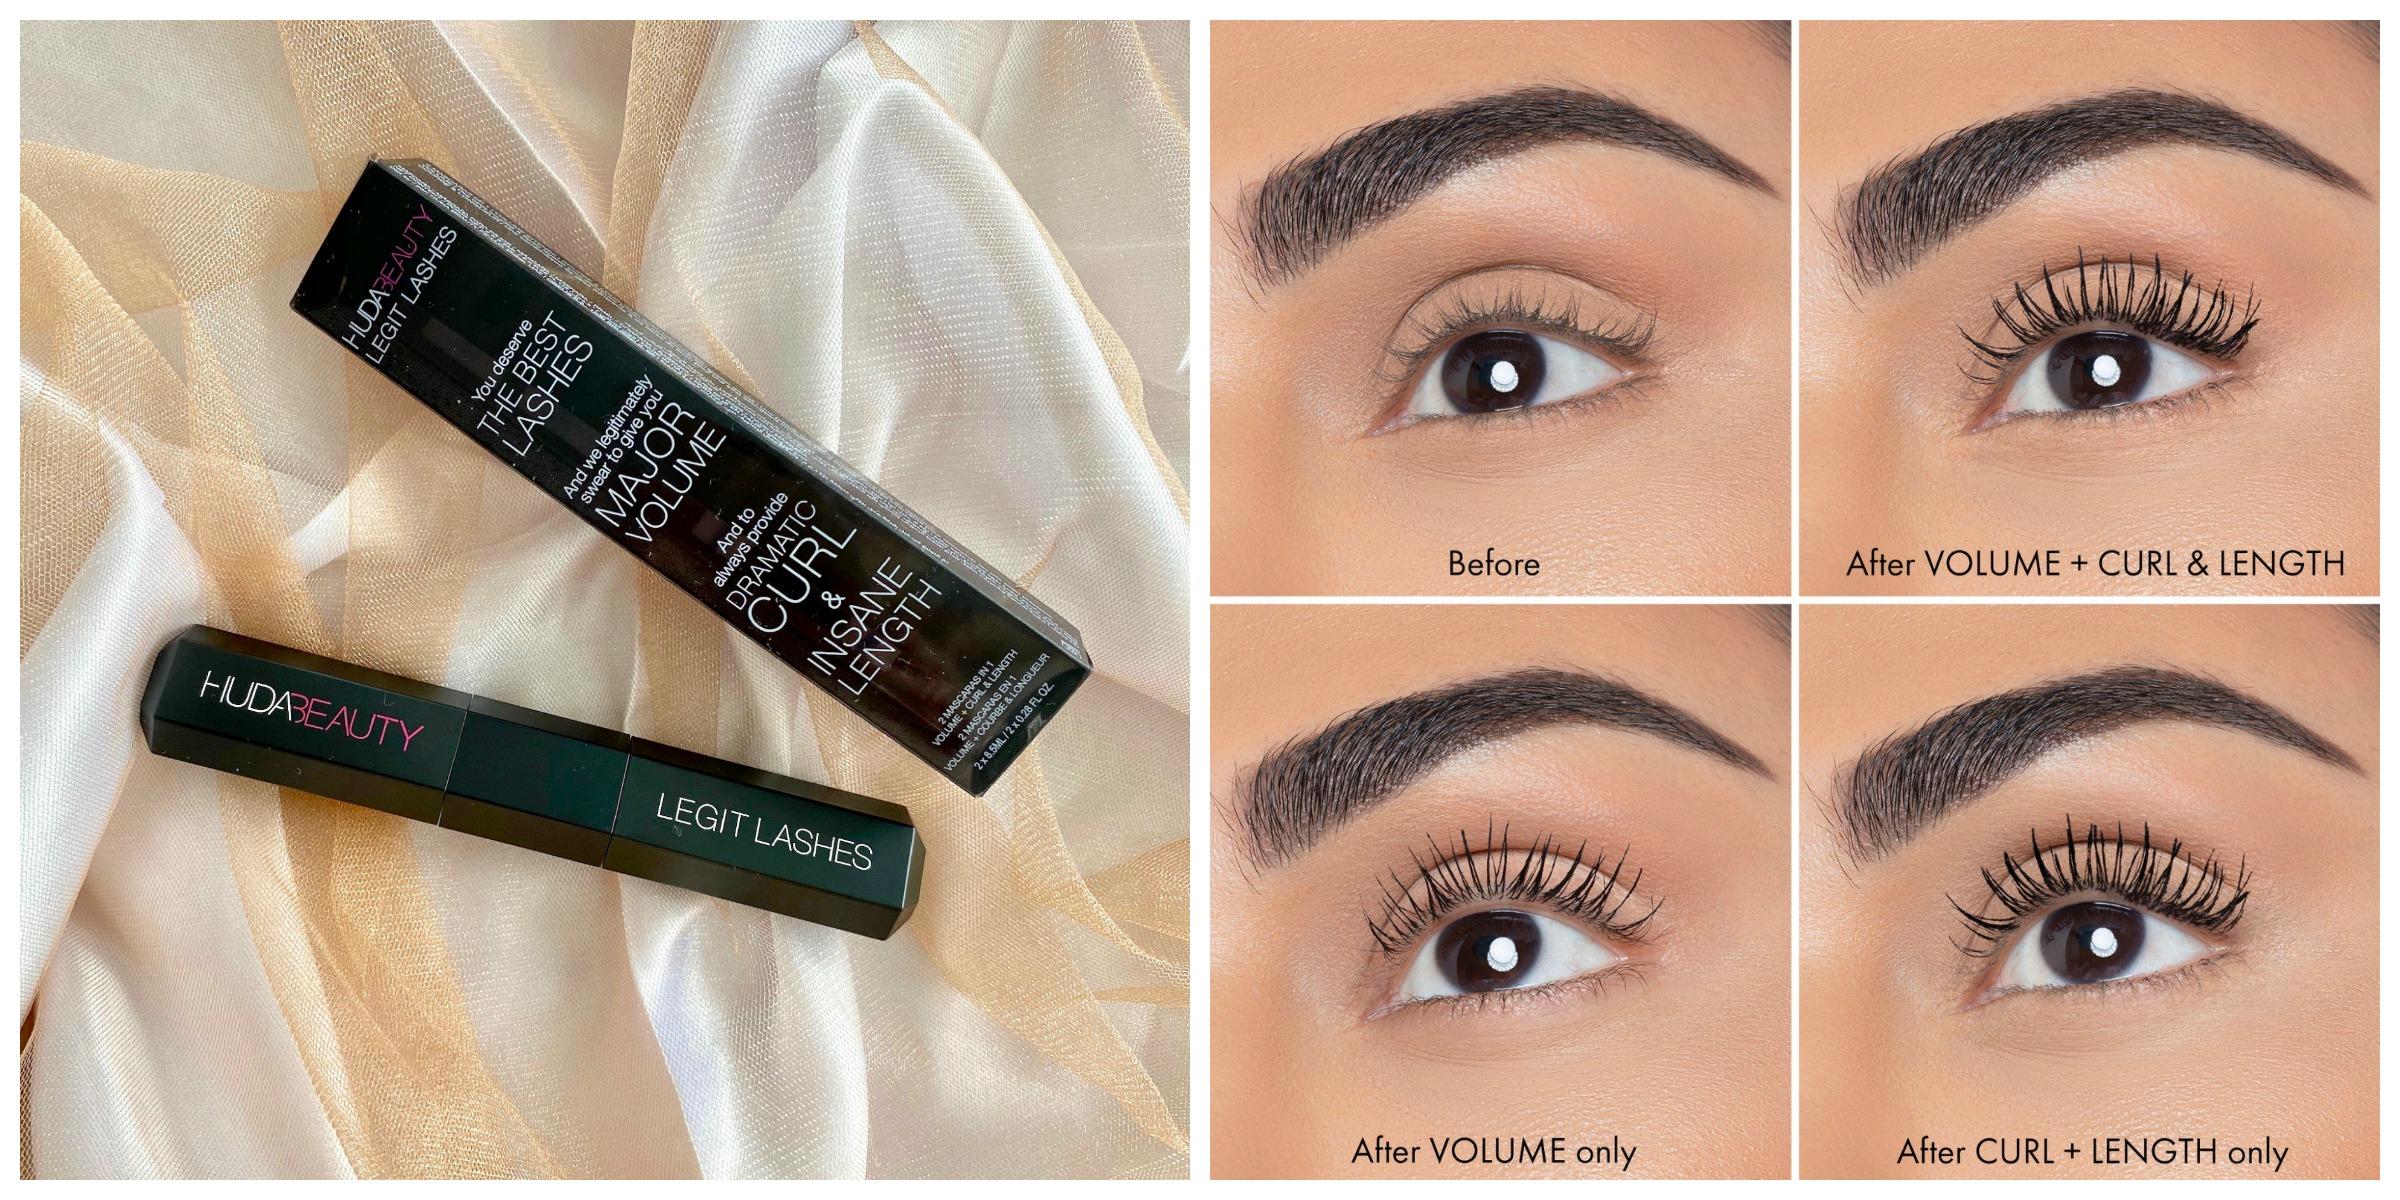 CentrO Shoplog huda beauty legit lashes